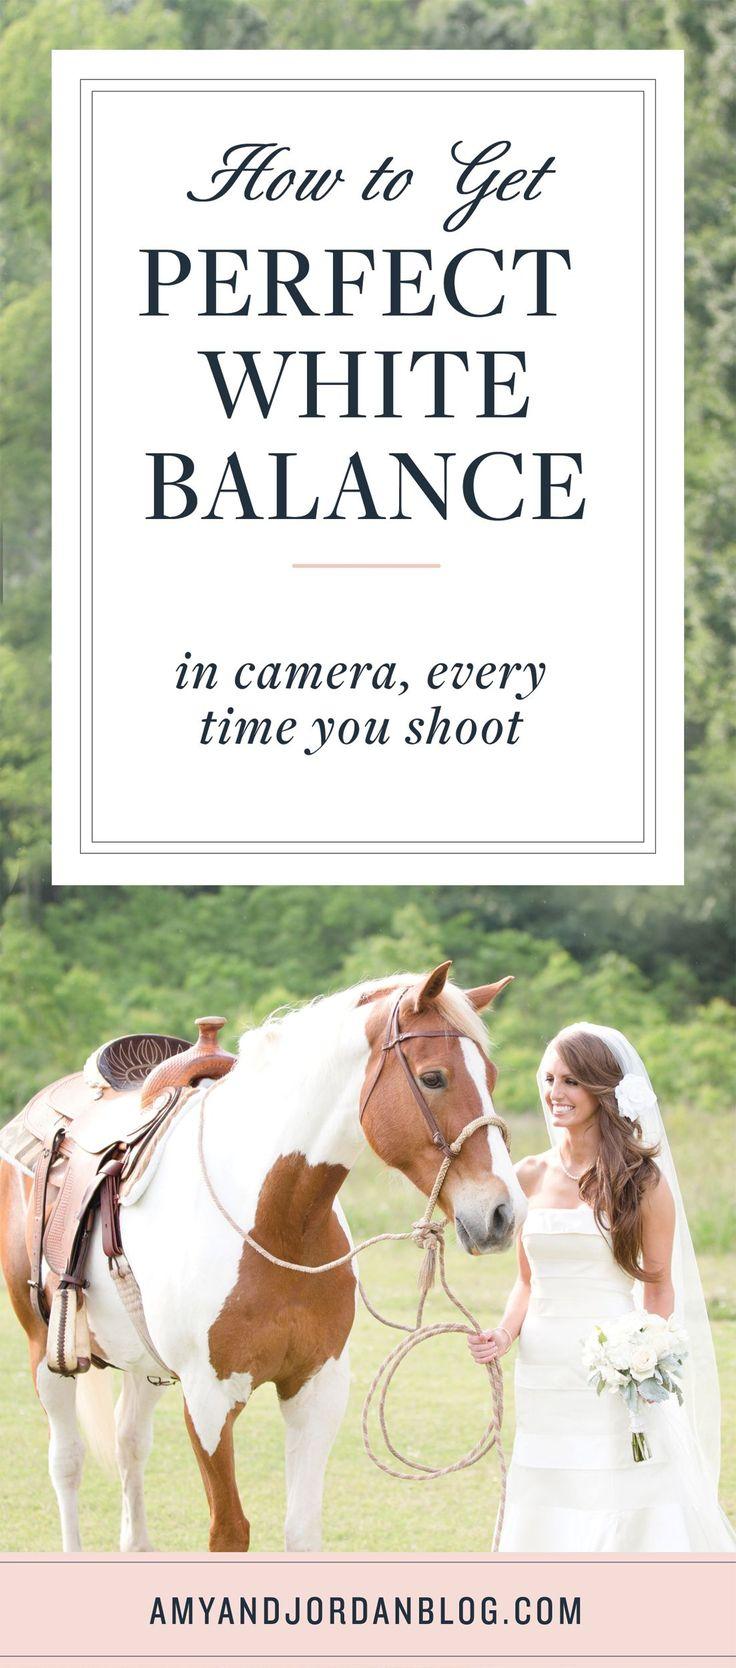 You searched for part 7 white balance - Phoenix, Arizona Wedding Photographers